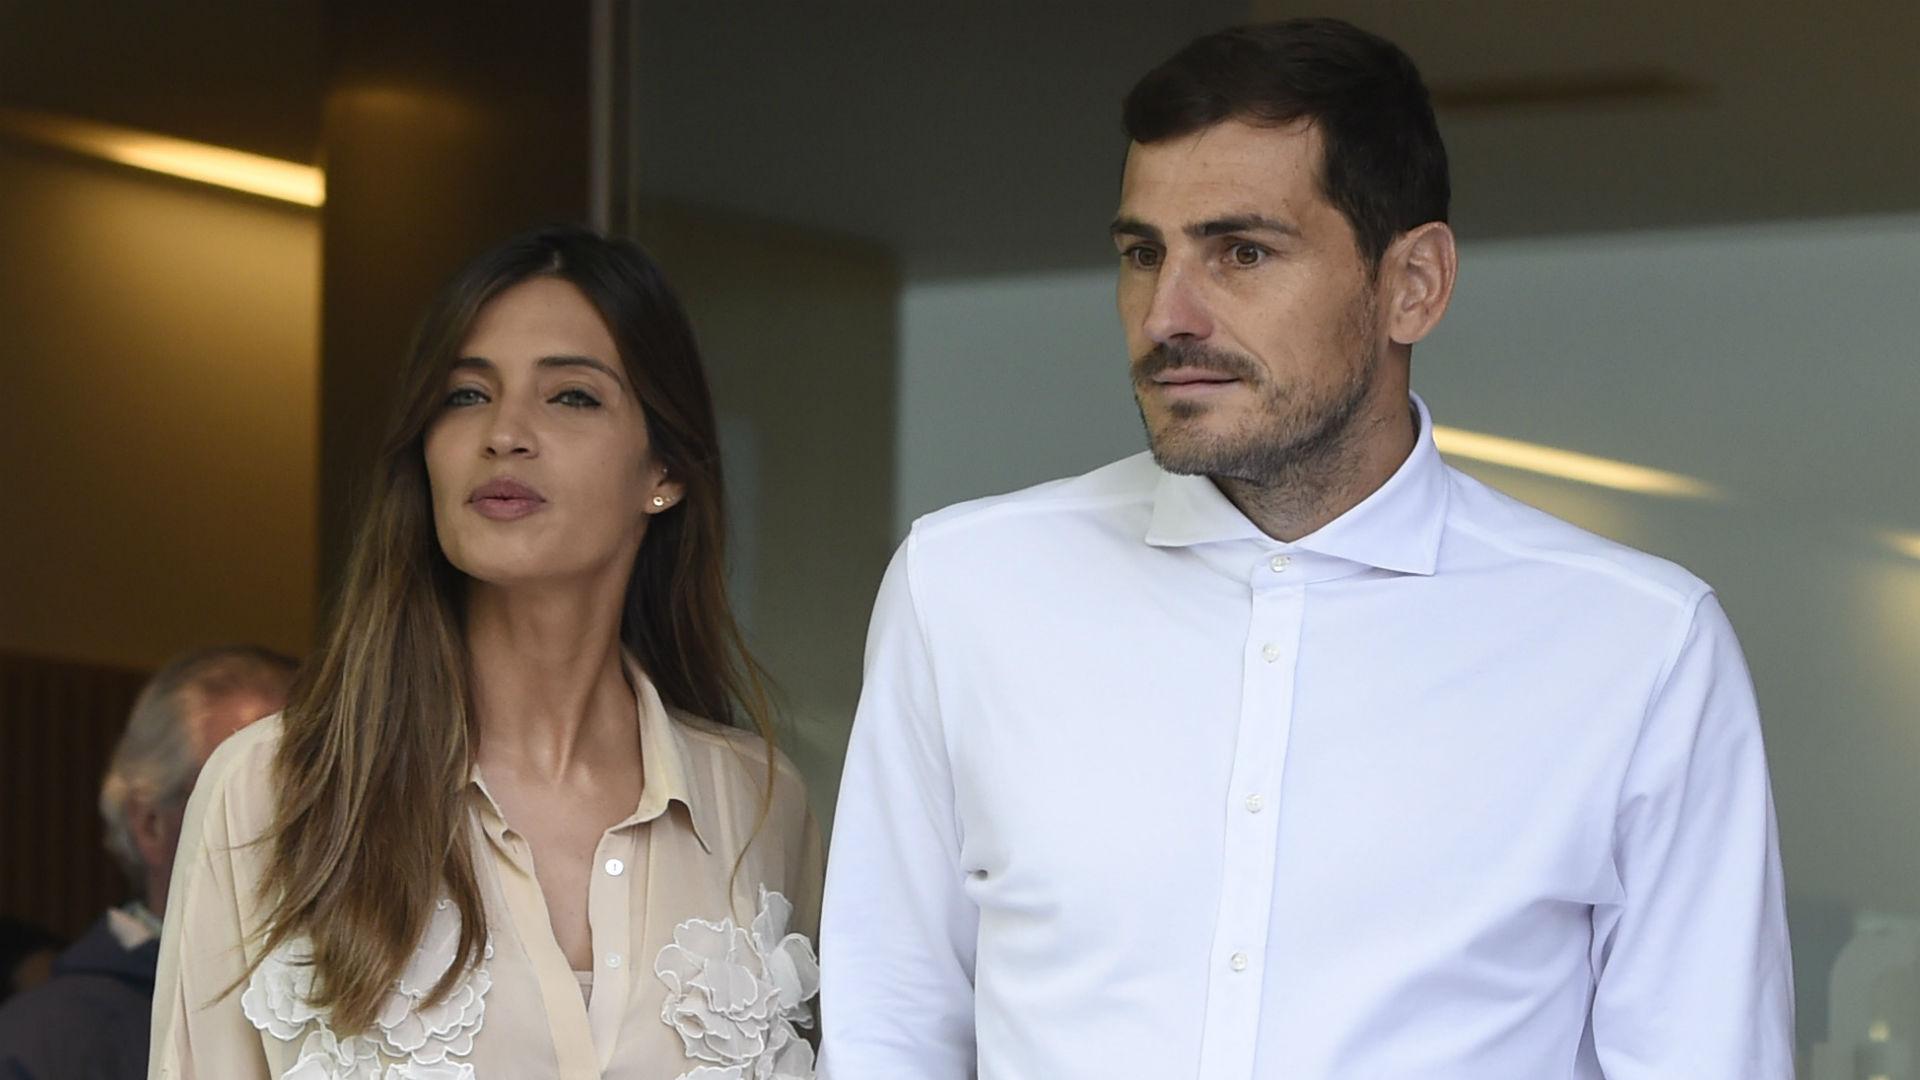 Sara Carbonero Iker Casillas 2019